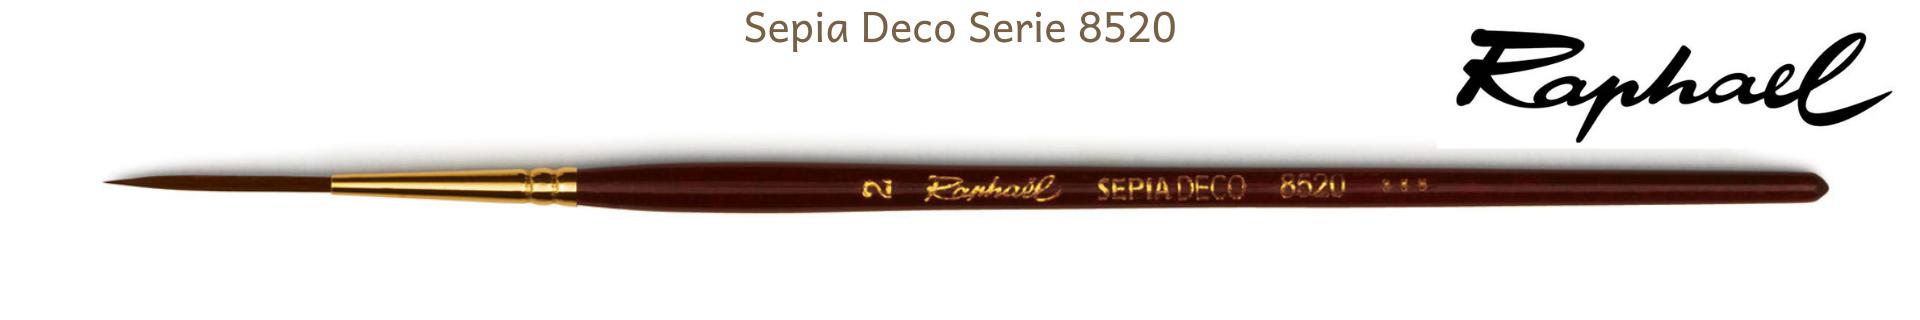 Raphael Sepia Deco 8520